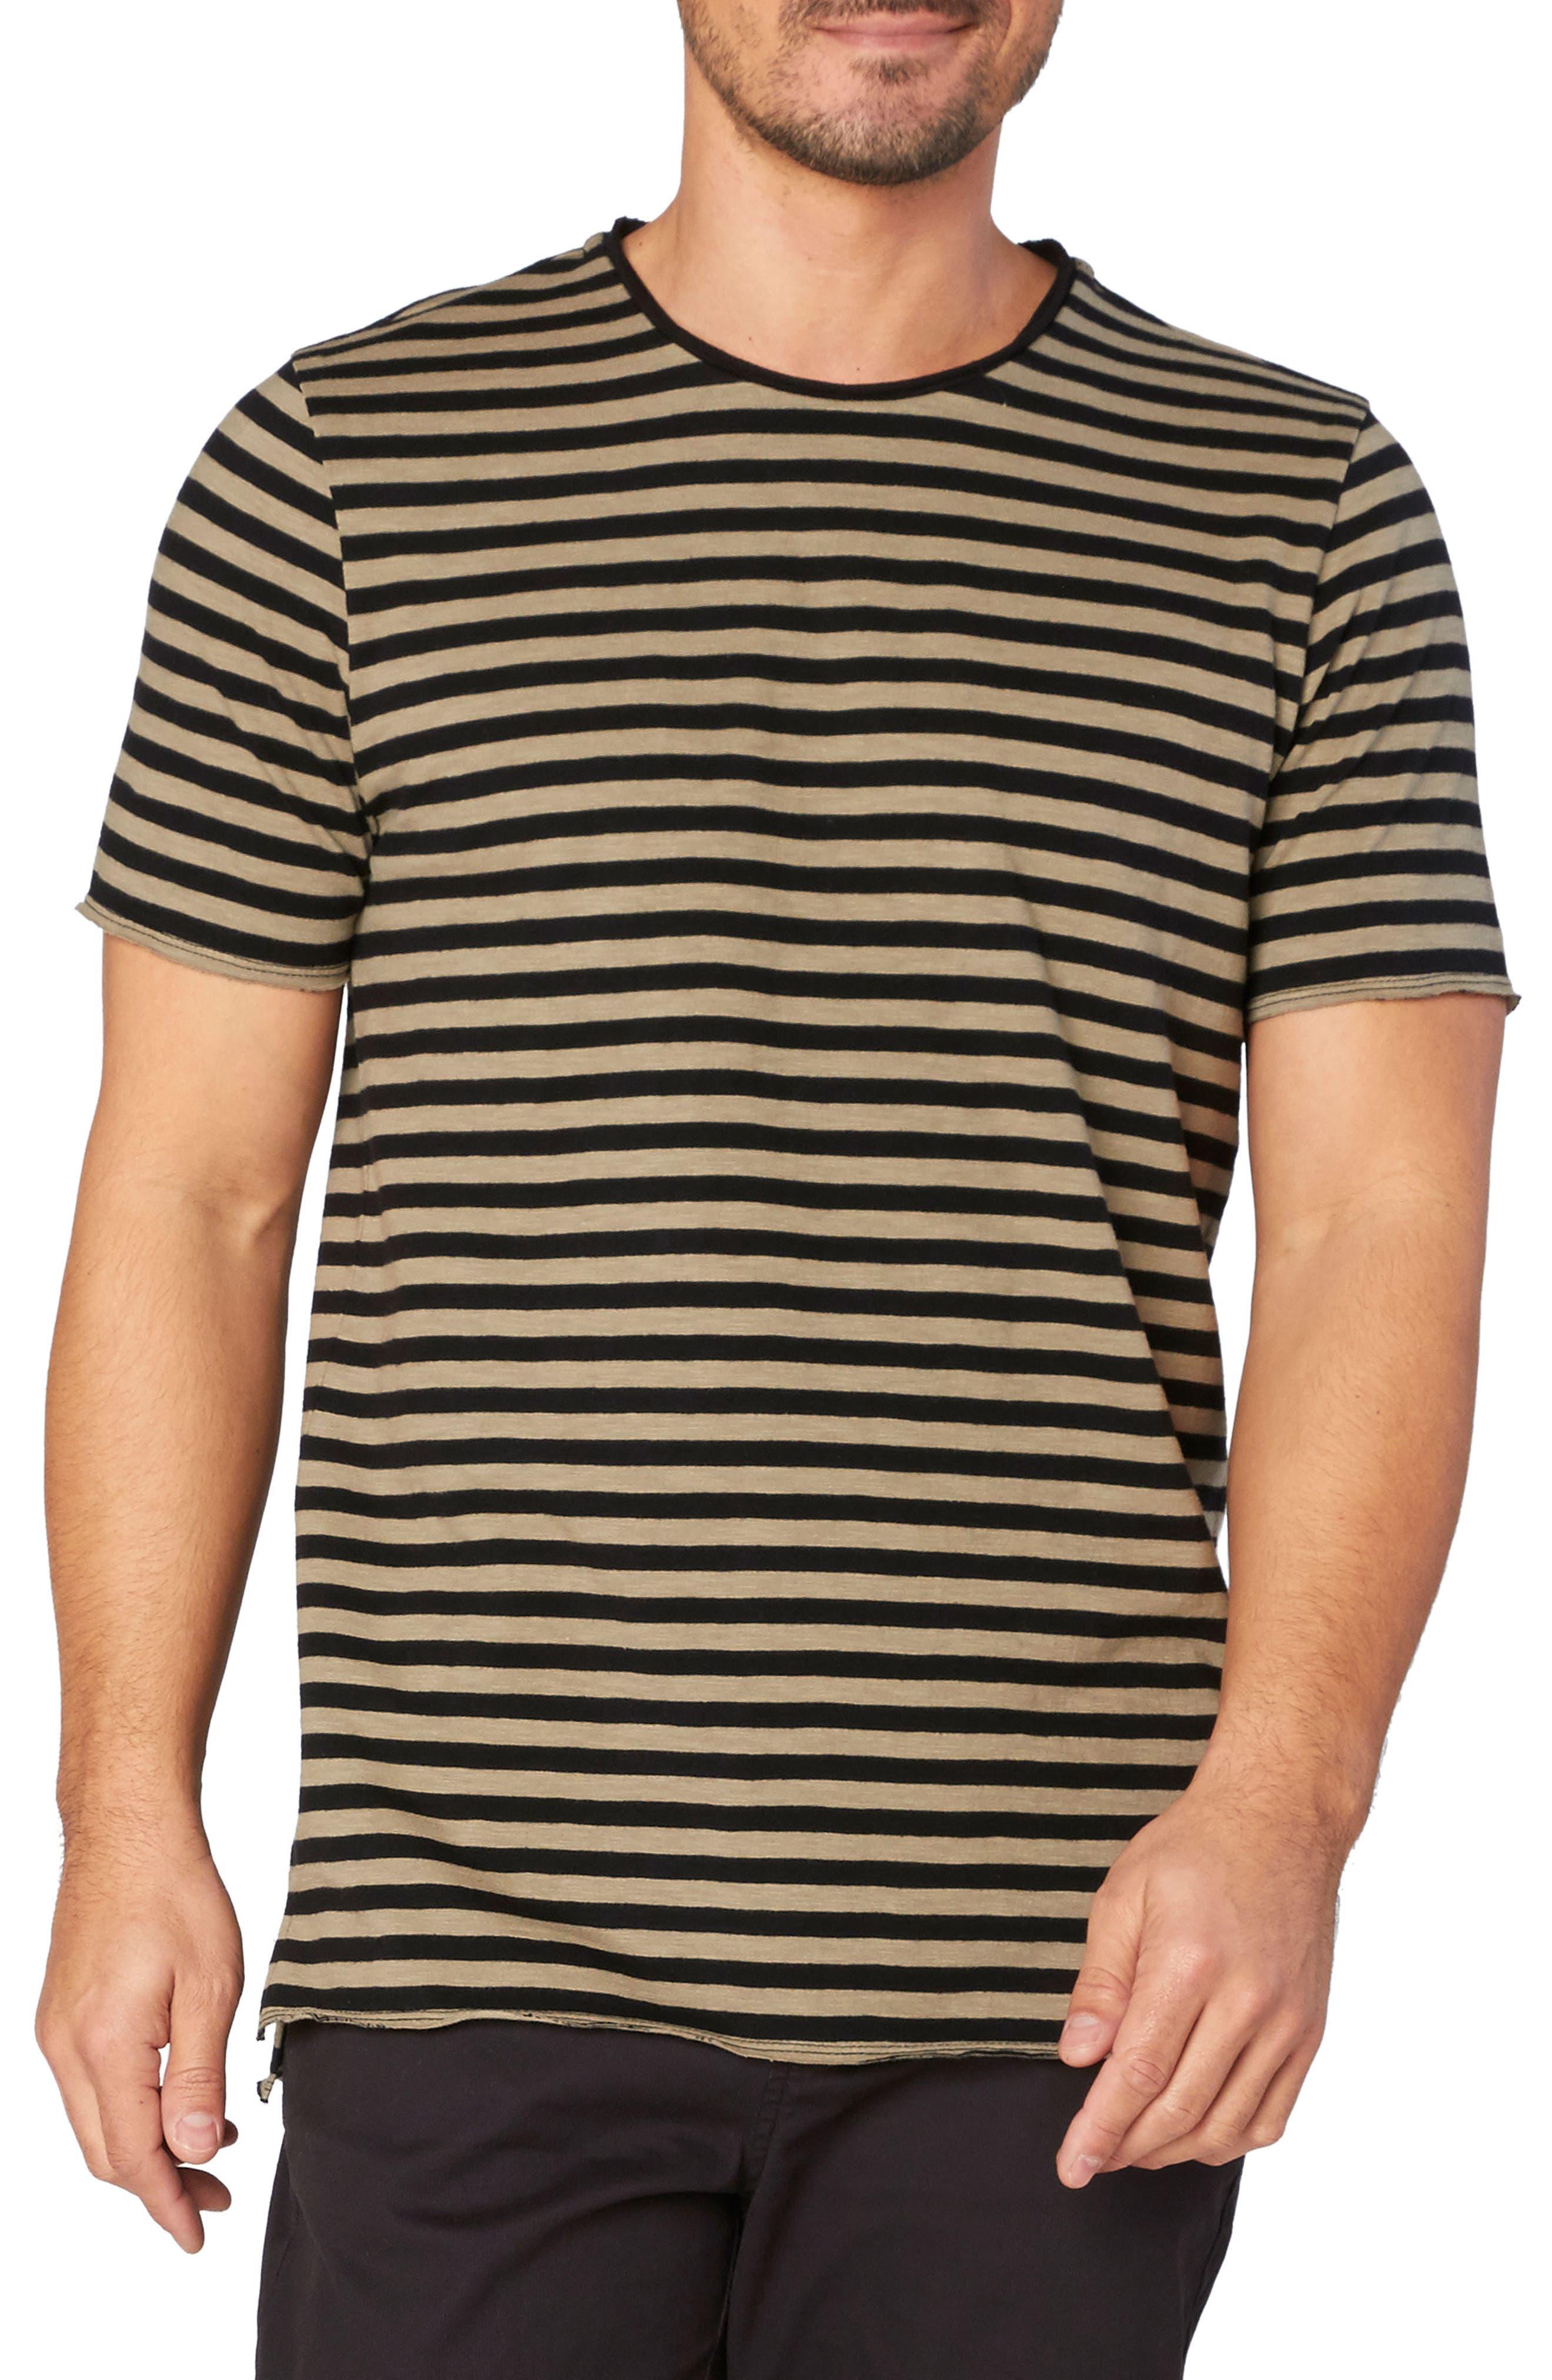 Threads for Thought Kane Slub Stripe T-Shirt